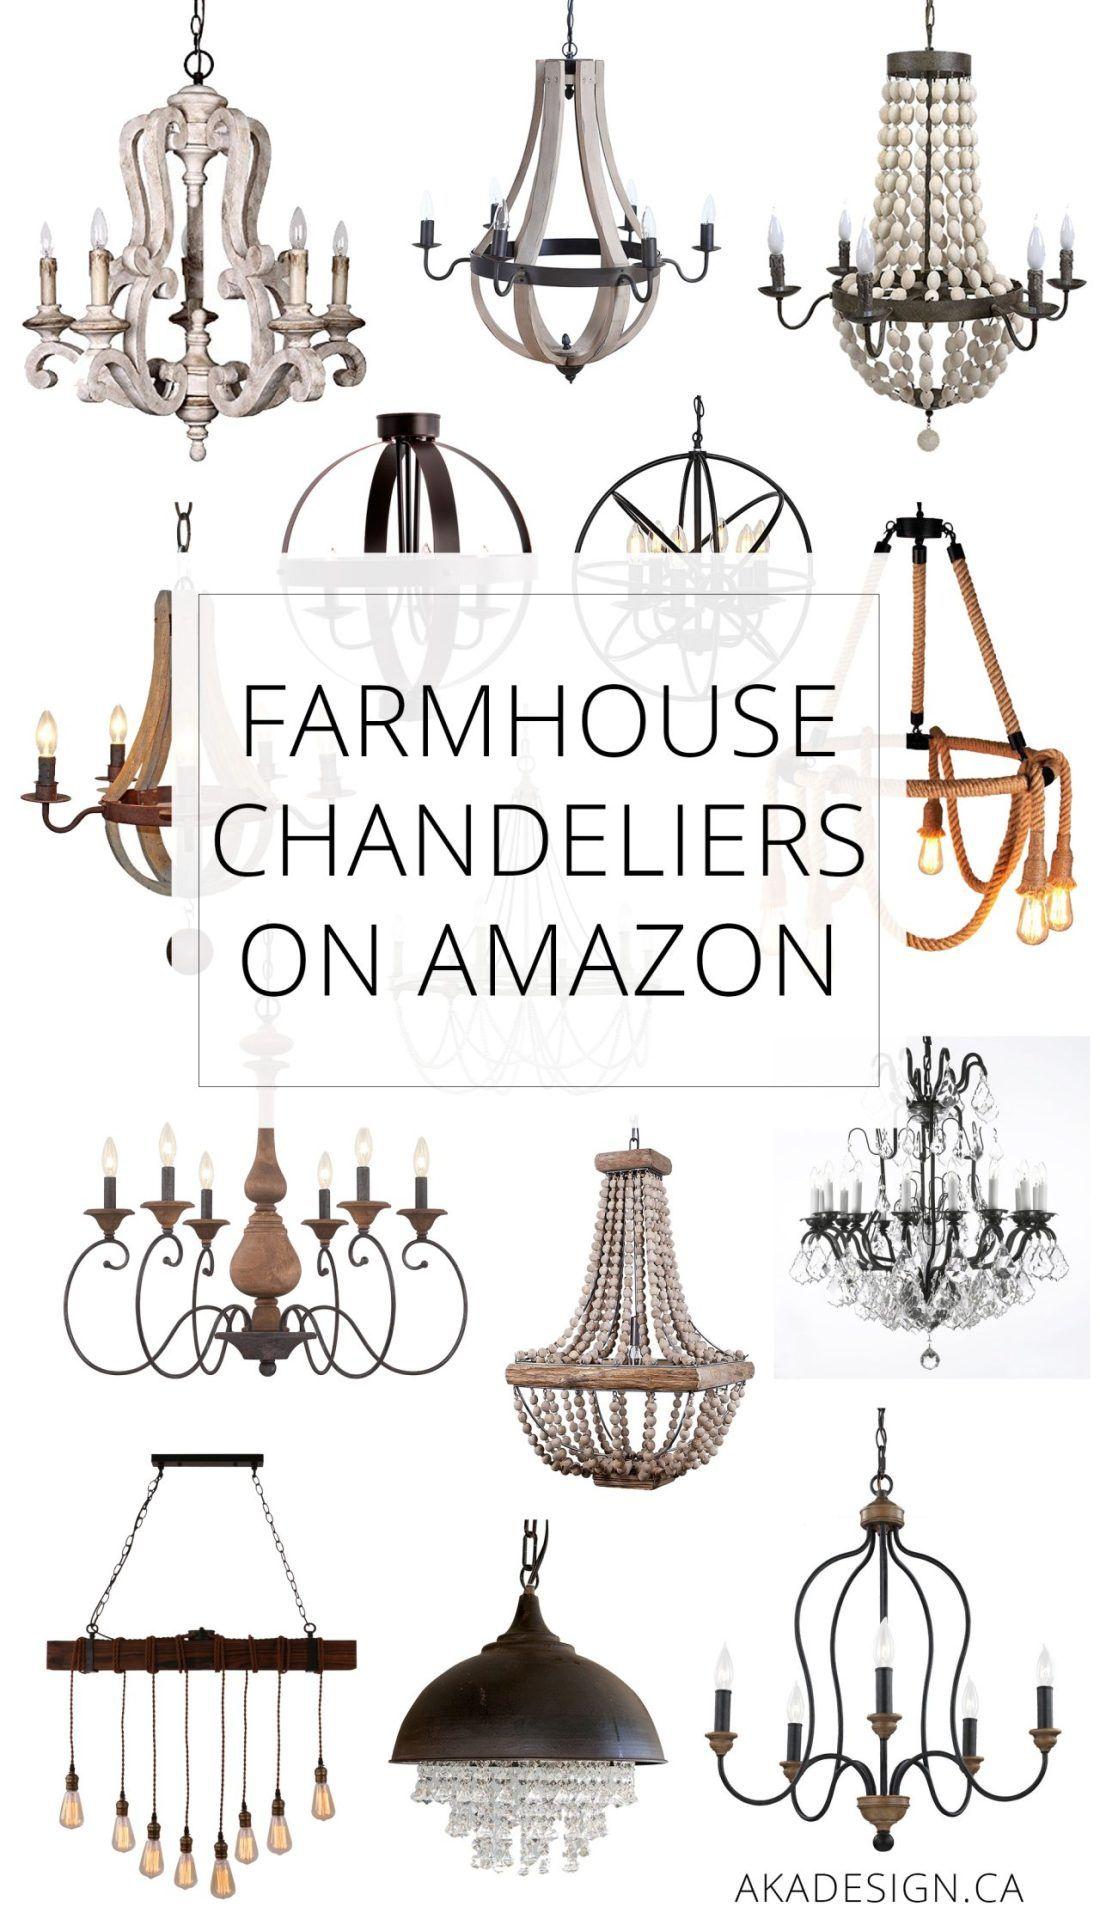 Farmhouse Chandeliers On Amazon Farmhouse Chandelier Chandelier Bedroom Chandelier